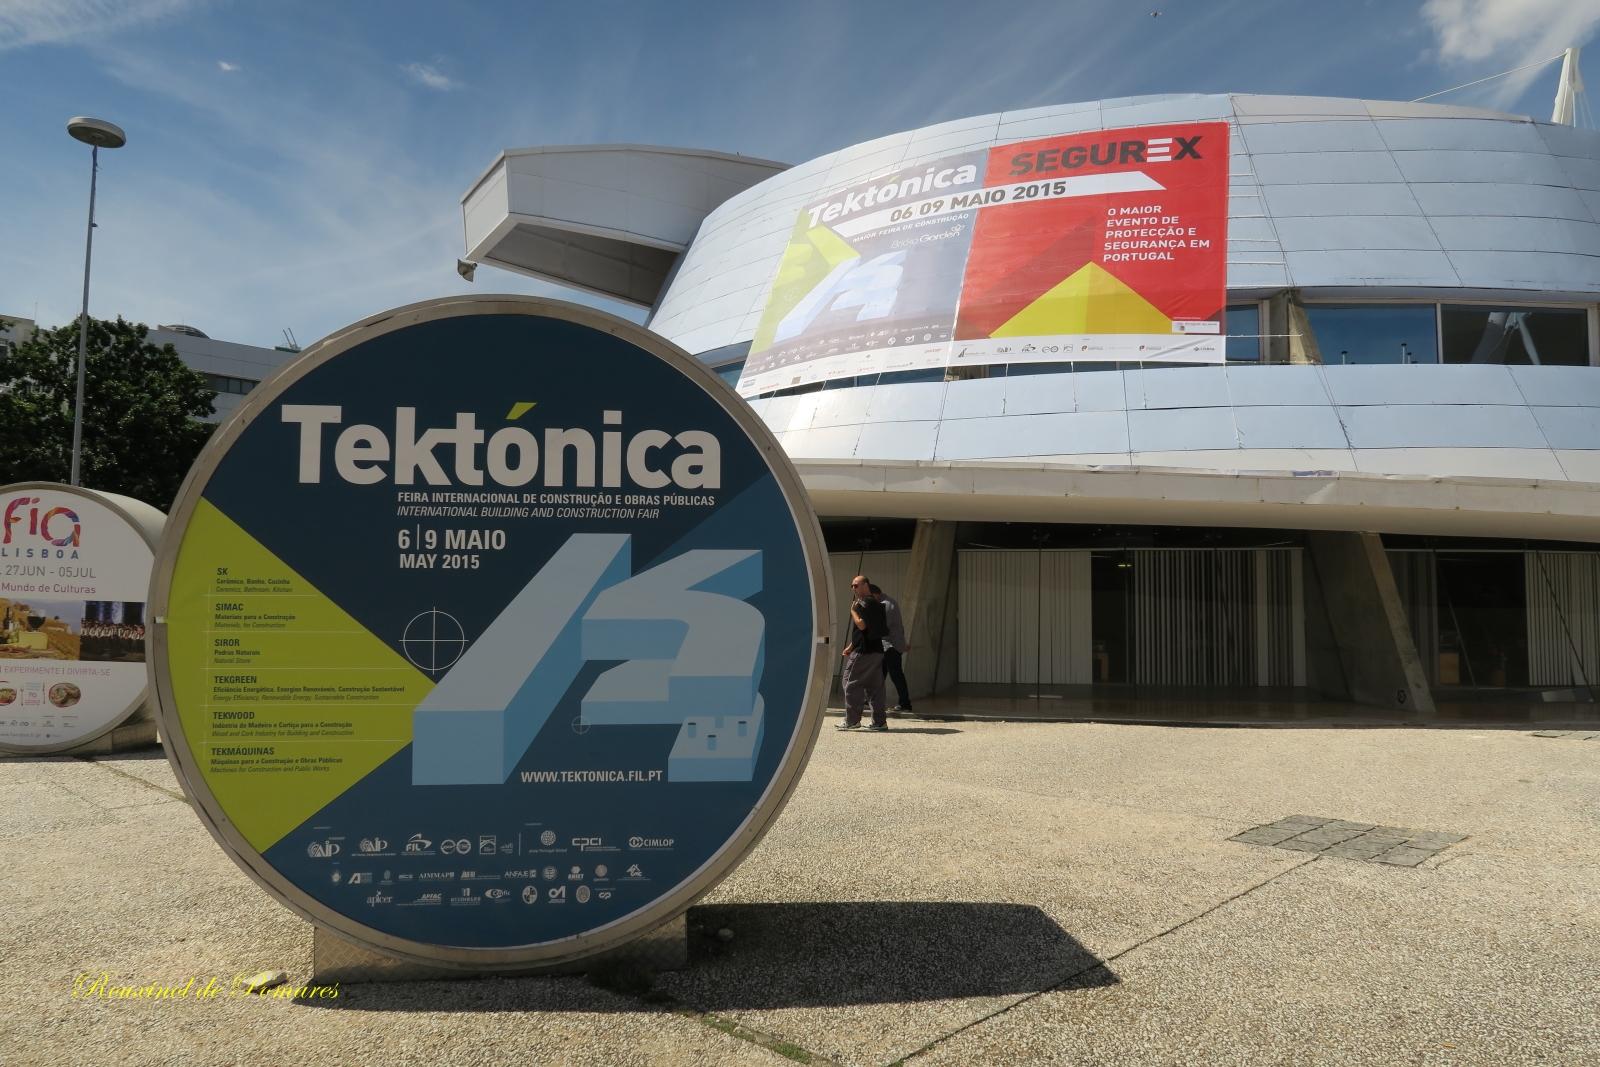 FIL Tektónica e Segurex 2015 (25)